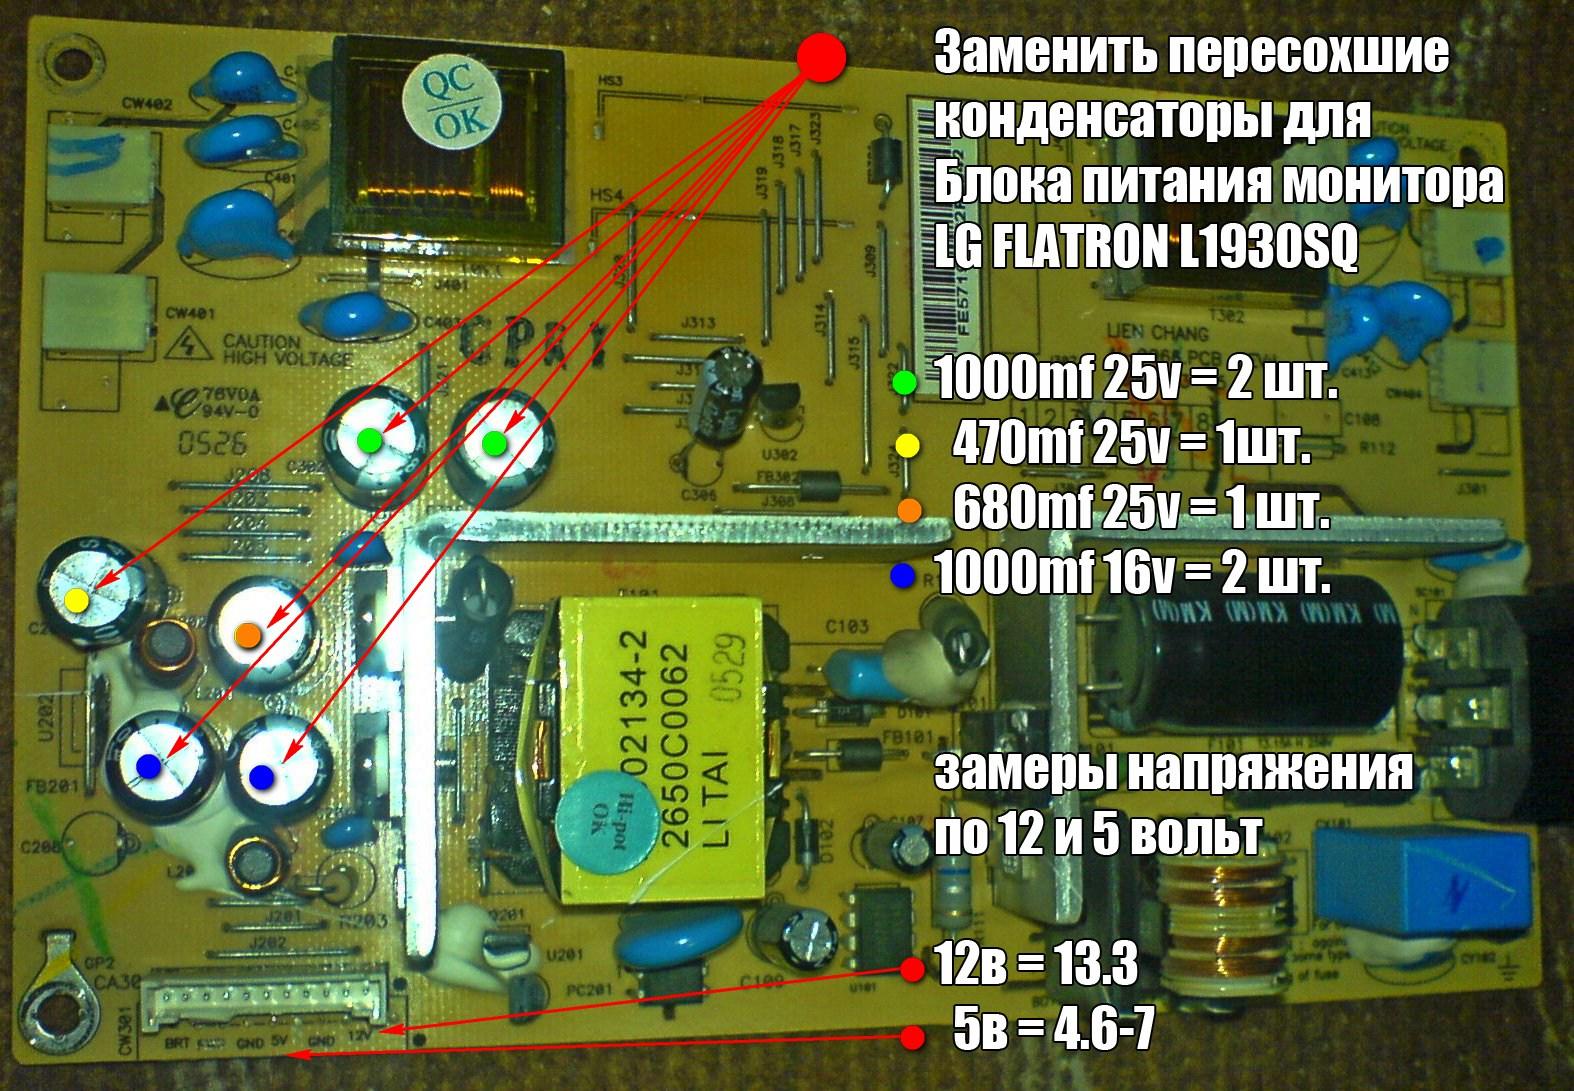 Не включается монитор (Блок питания LG FLATRON L1930SQ)